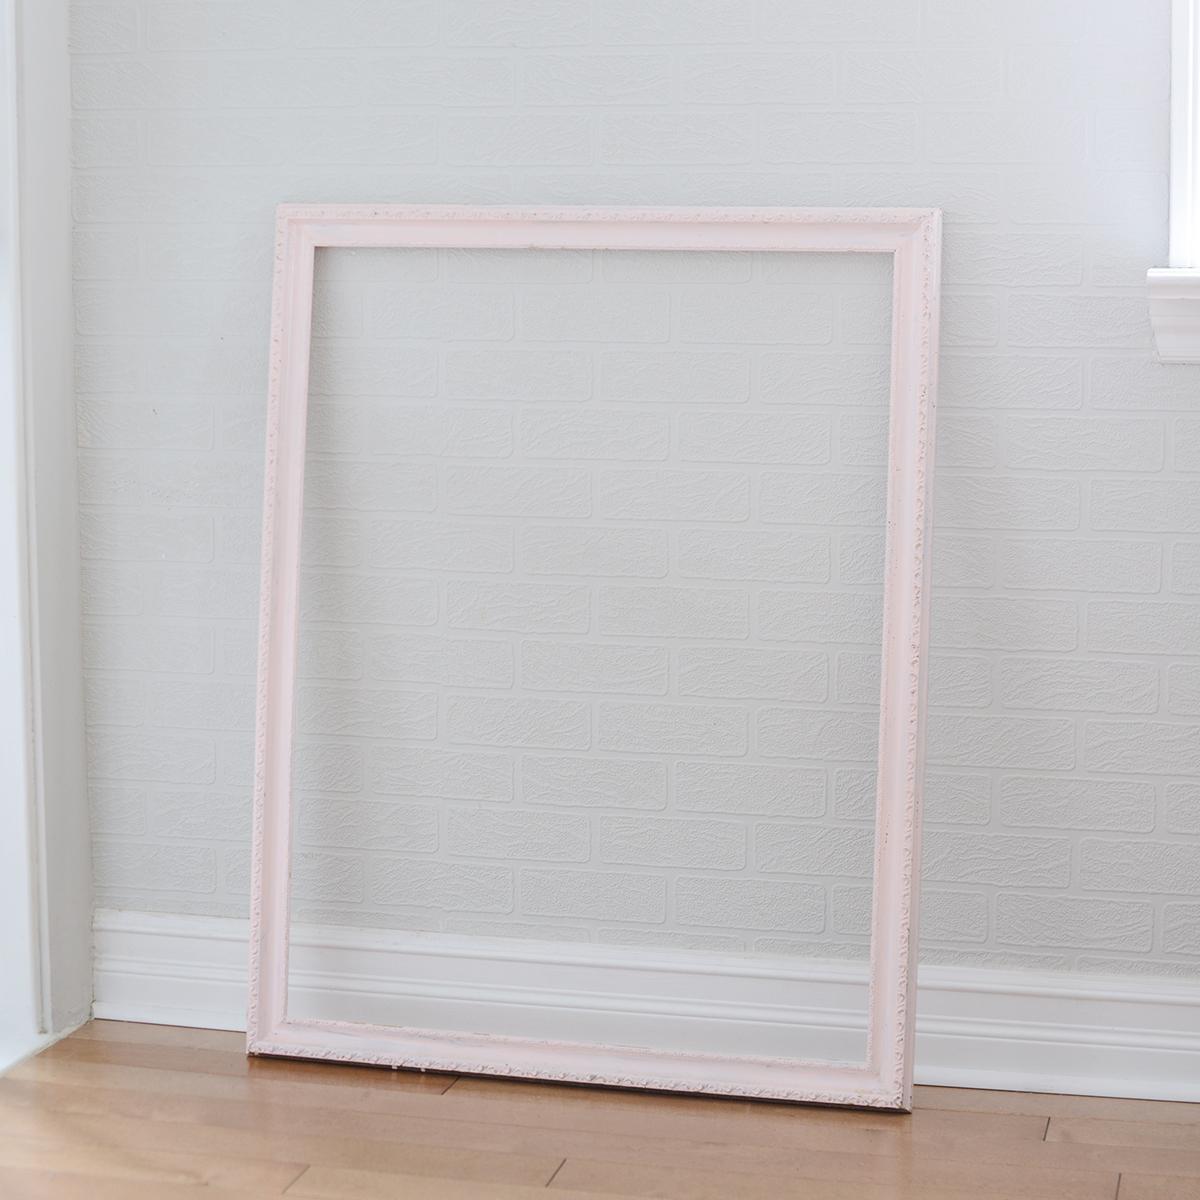 "34"" x 26"" nellie frame"